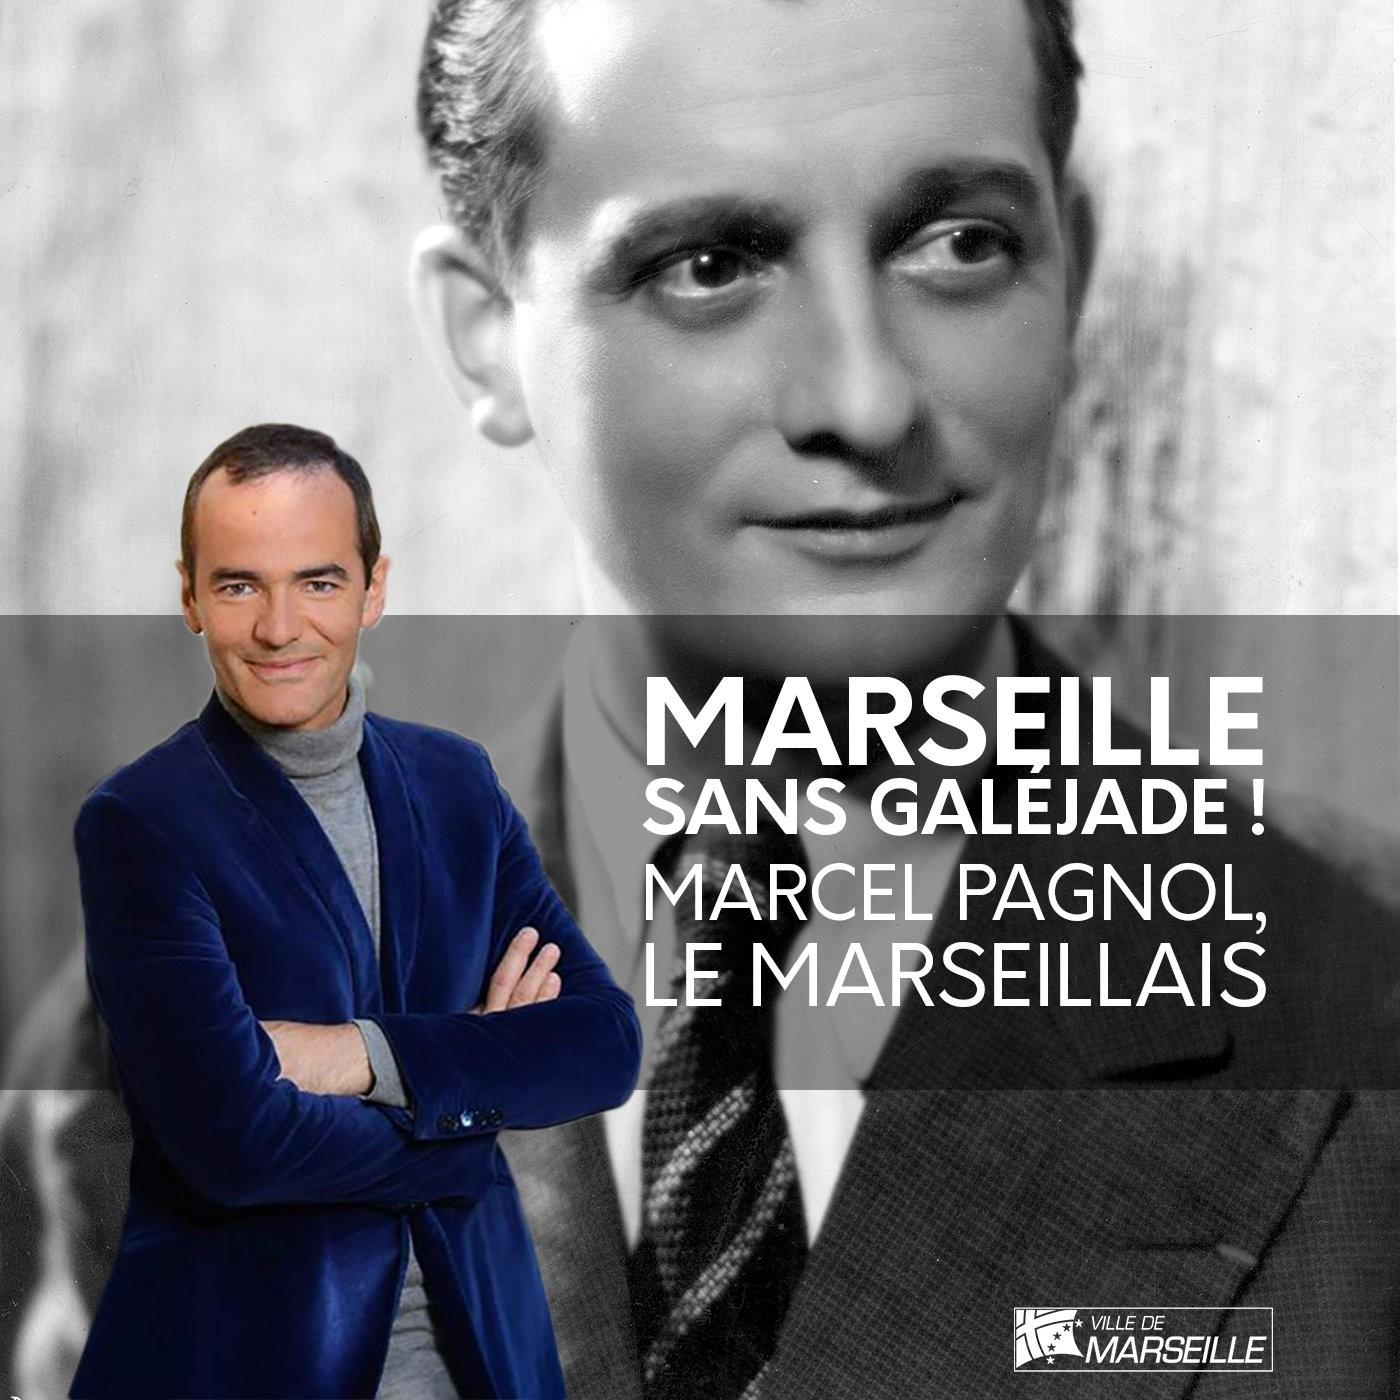 #10 - Marcel Pagnol, le marseillais